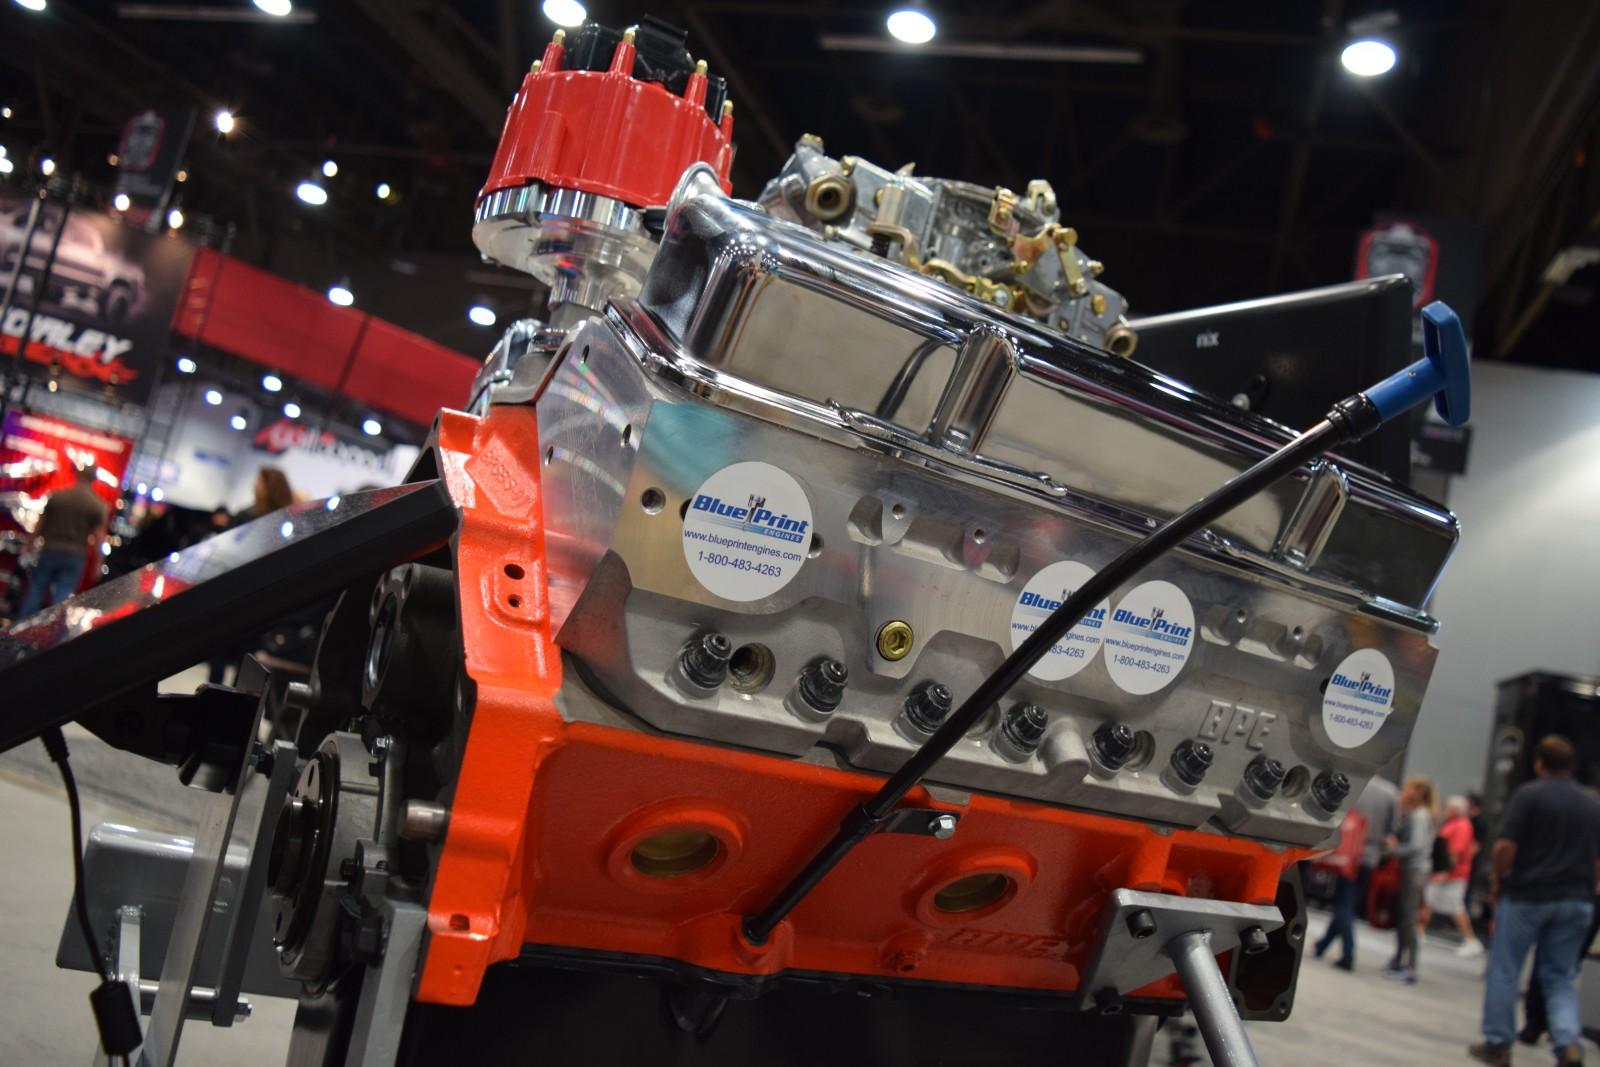 Blueprint engines to showcase new chevrolet 400 engine line at sema blueprint engines to showcase new chevrolet 400 engine line at sema 2015 onallcylinders malvernweather Choice Image